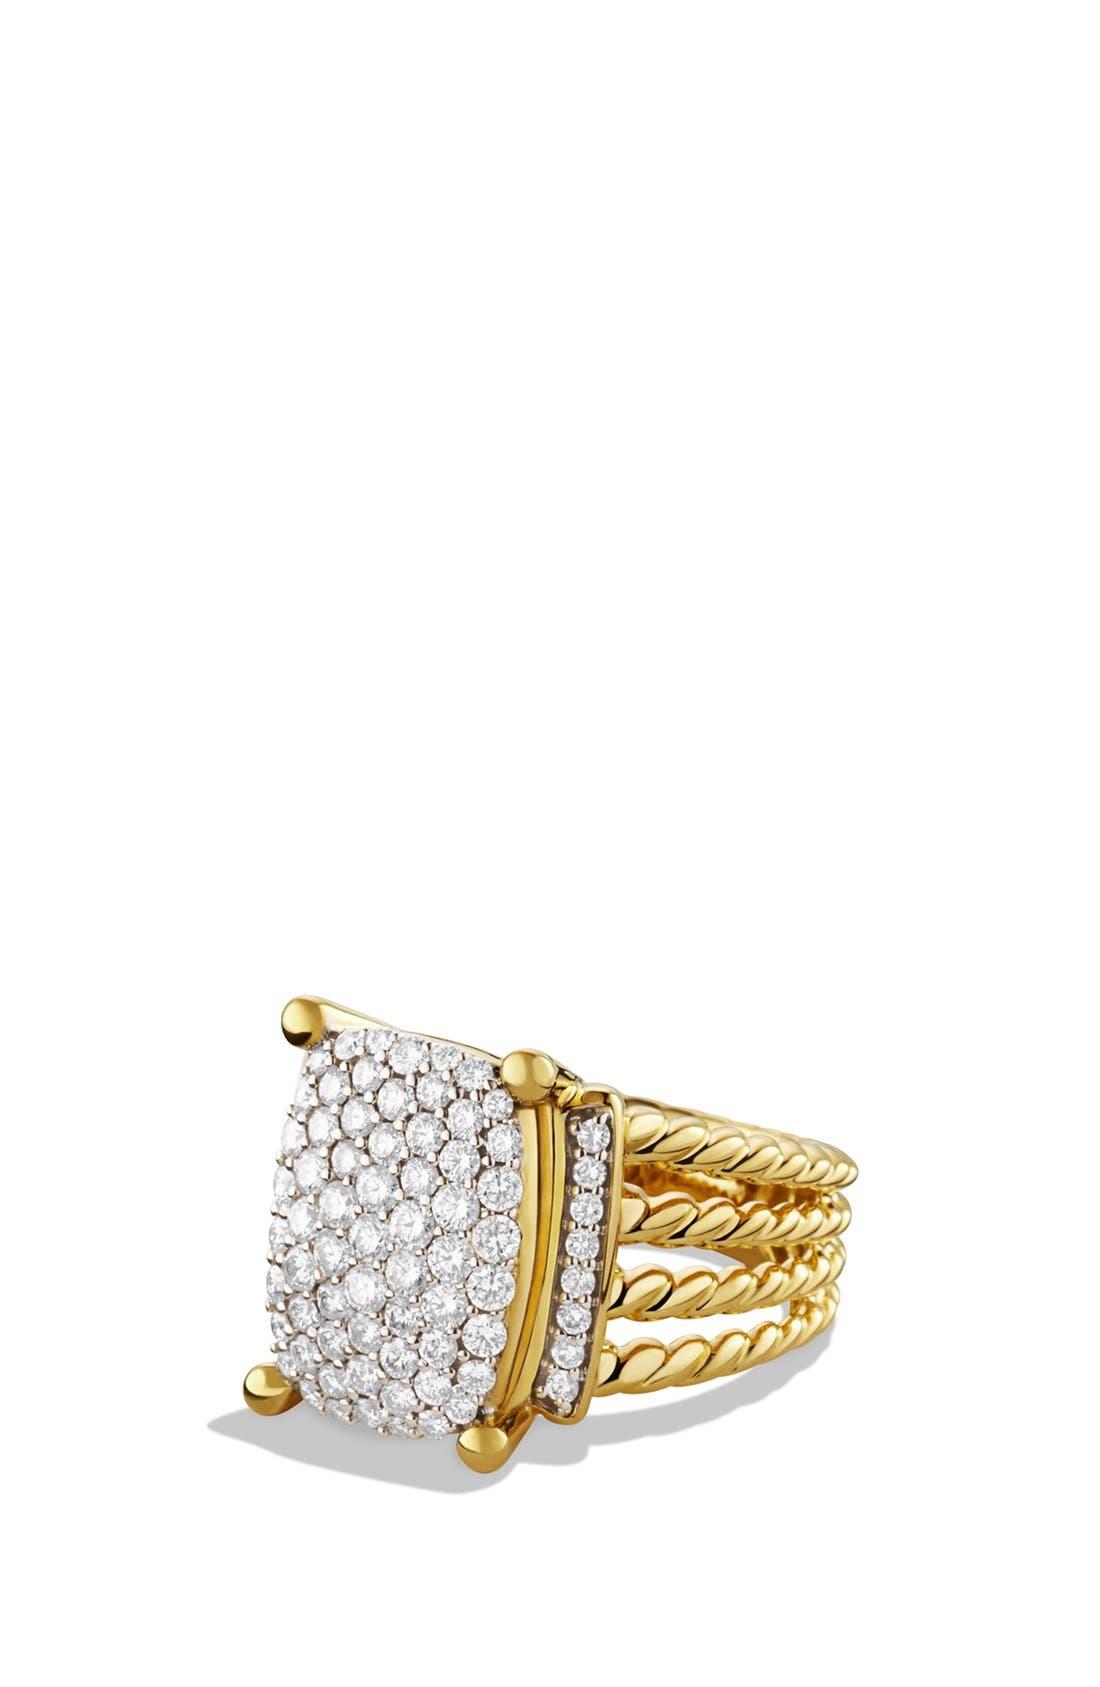 'Wheaton' Ring with Diamonds in Gold,                             Main thumbnail 1, color,                             Diamond